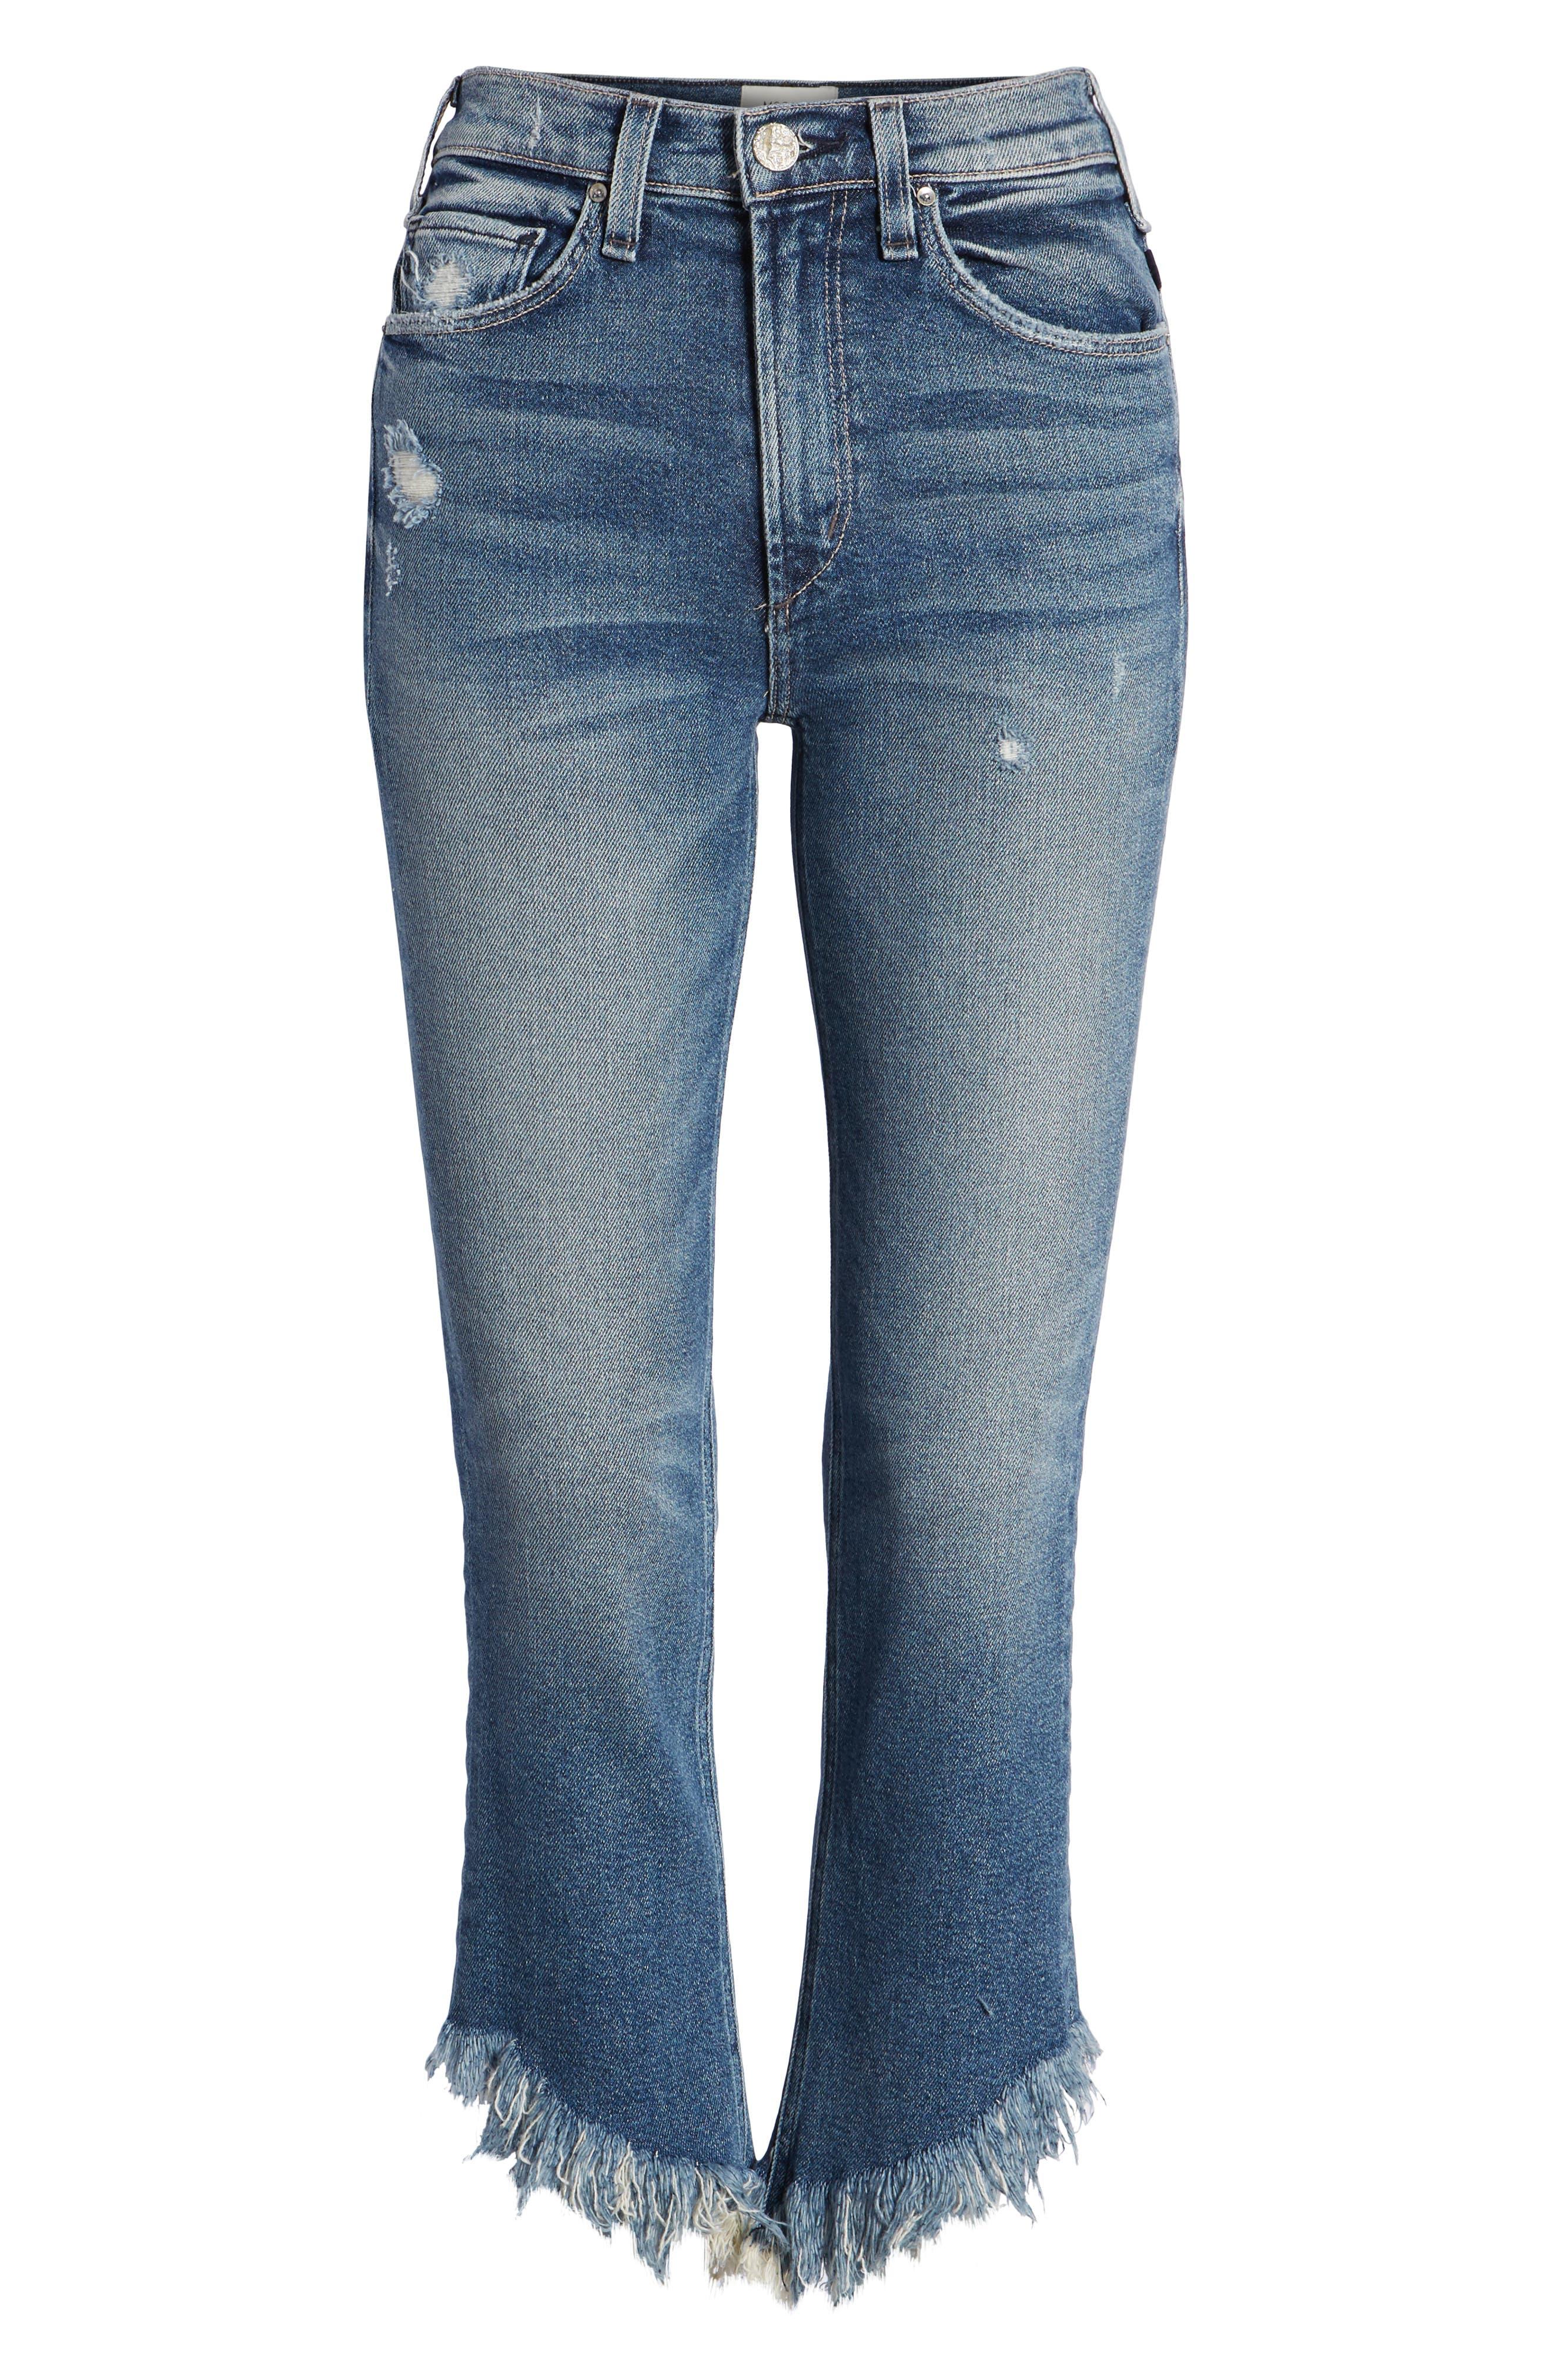 Valletta High Waist Crop Straight Leg Jeans,                             Alternate thumbnail 6, color,                             Goldi